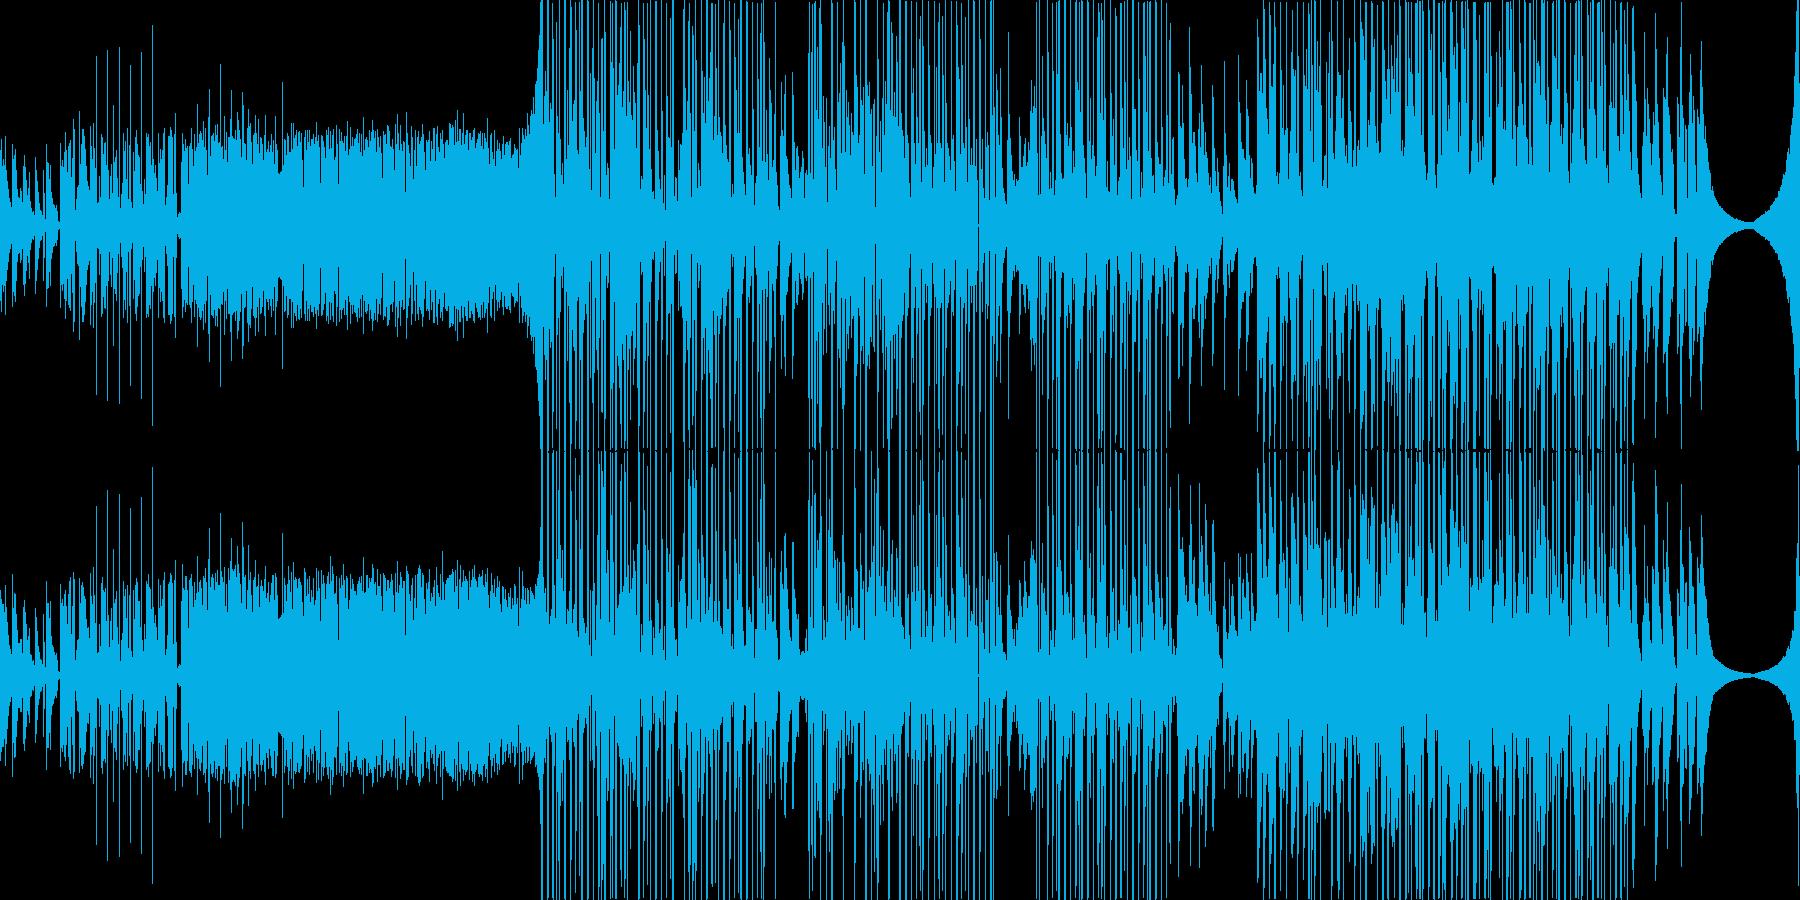 Bitterの再生済みの波形